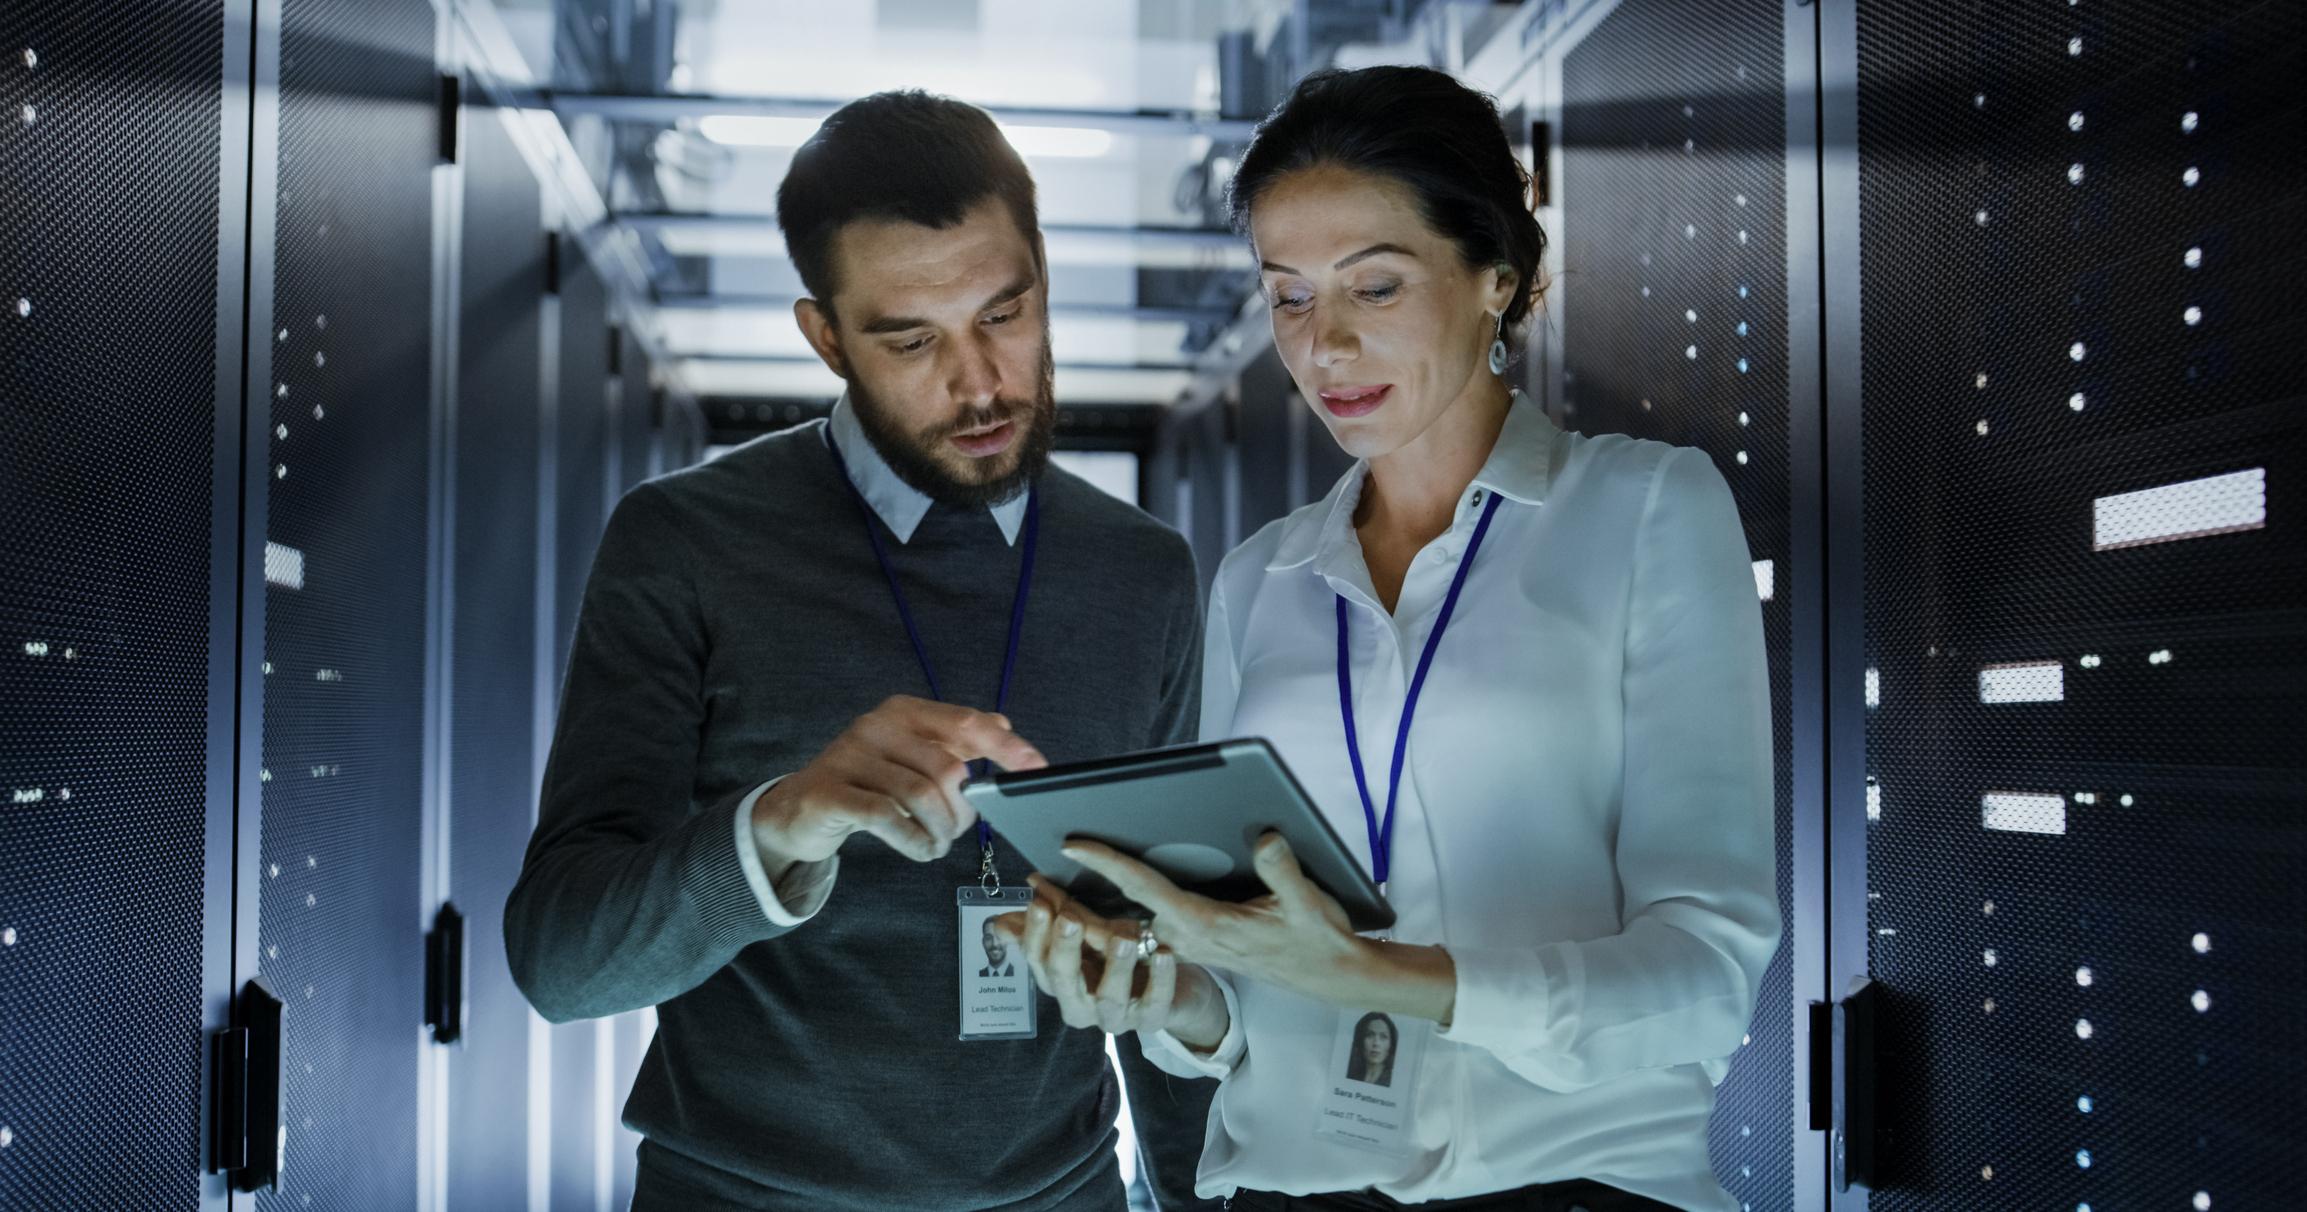 IT engineers mitigating cyber risks in server room